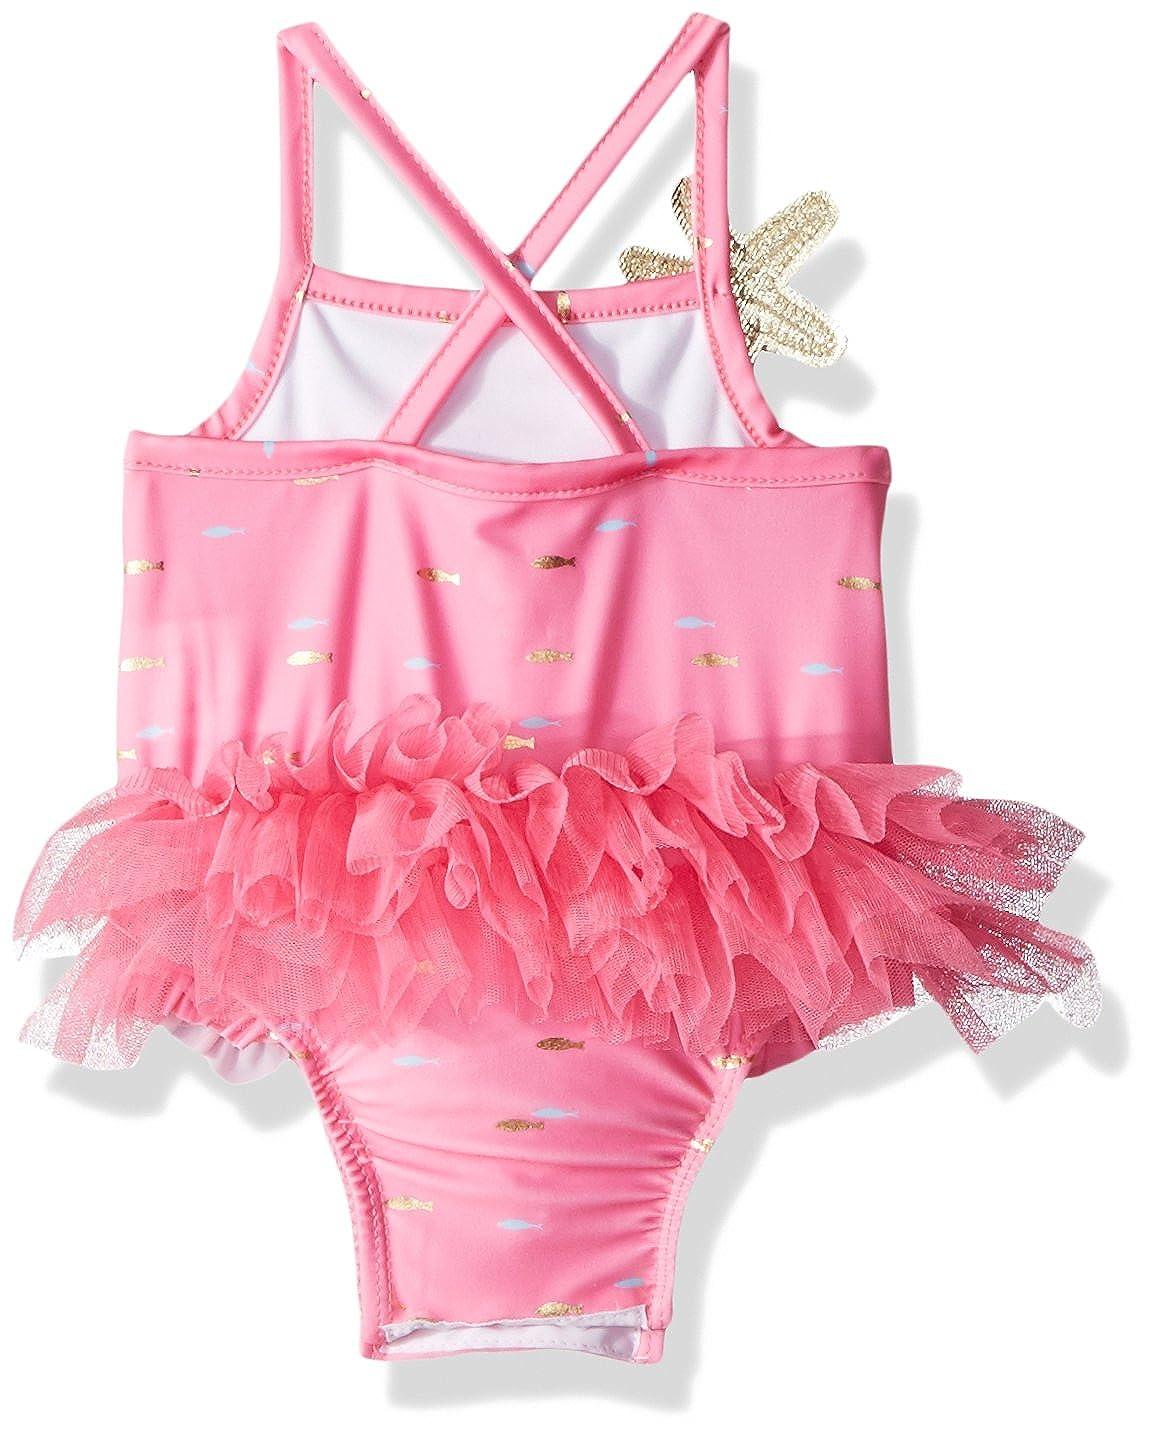 b5ac70d4a2132 Amazon.com: Mud Pie Baby Girls Mermaid Ruffle One Piece Swimsuit: Clothing